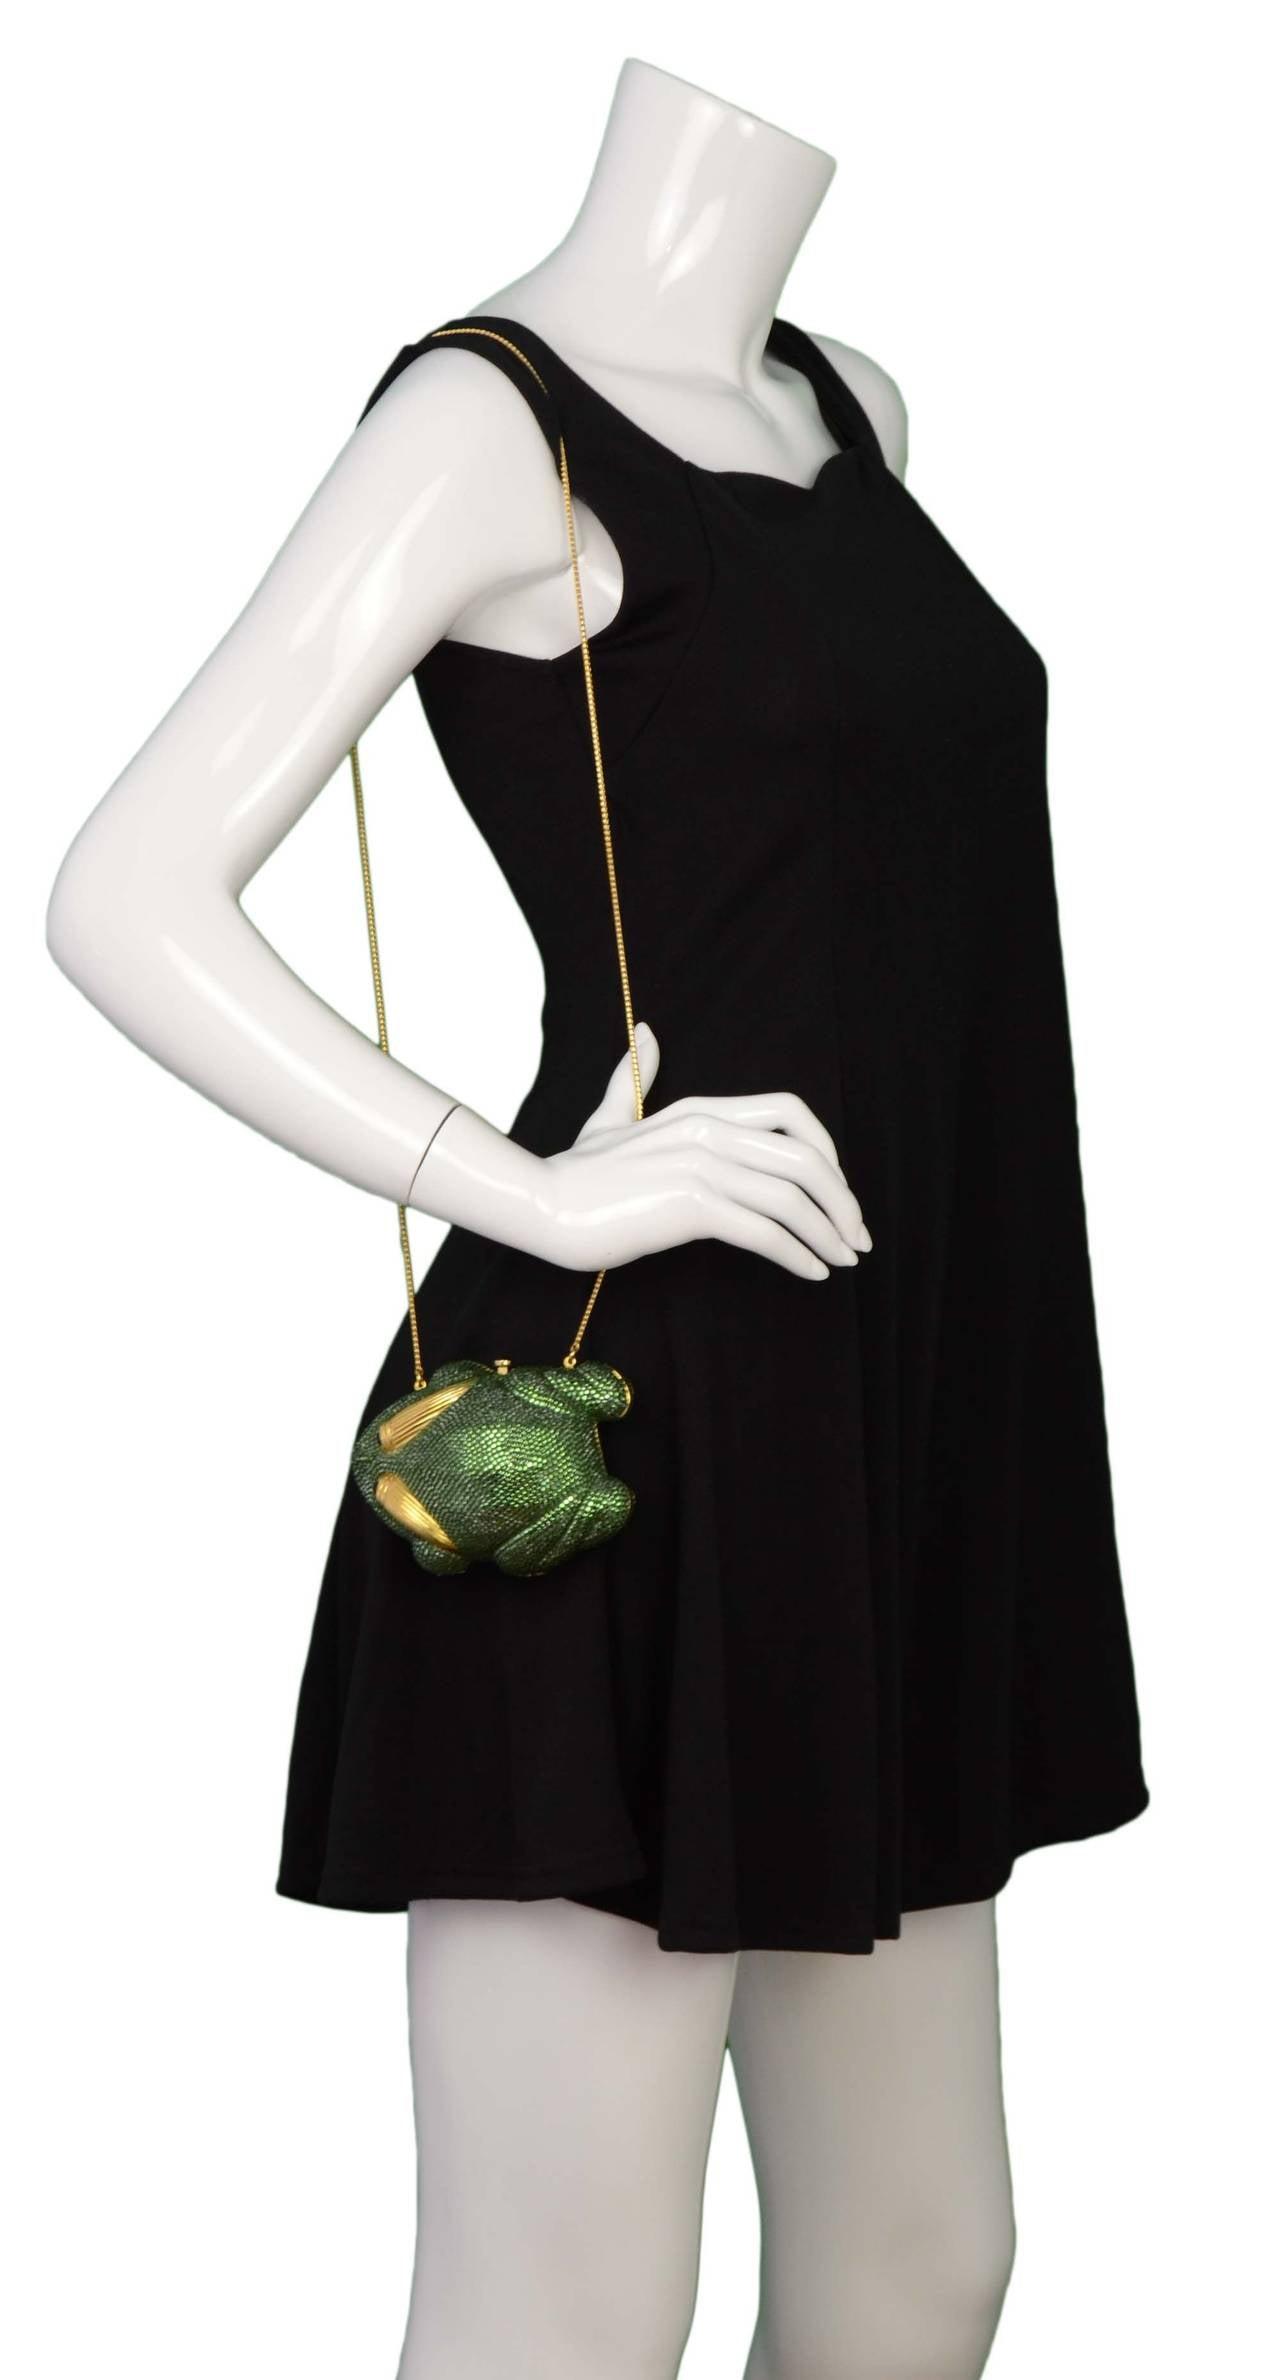 Judith Leiber Green Crystal Frog Minaudiere Bag GHW 7